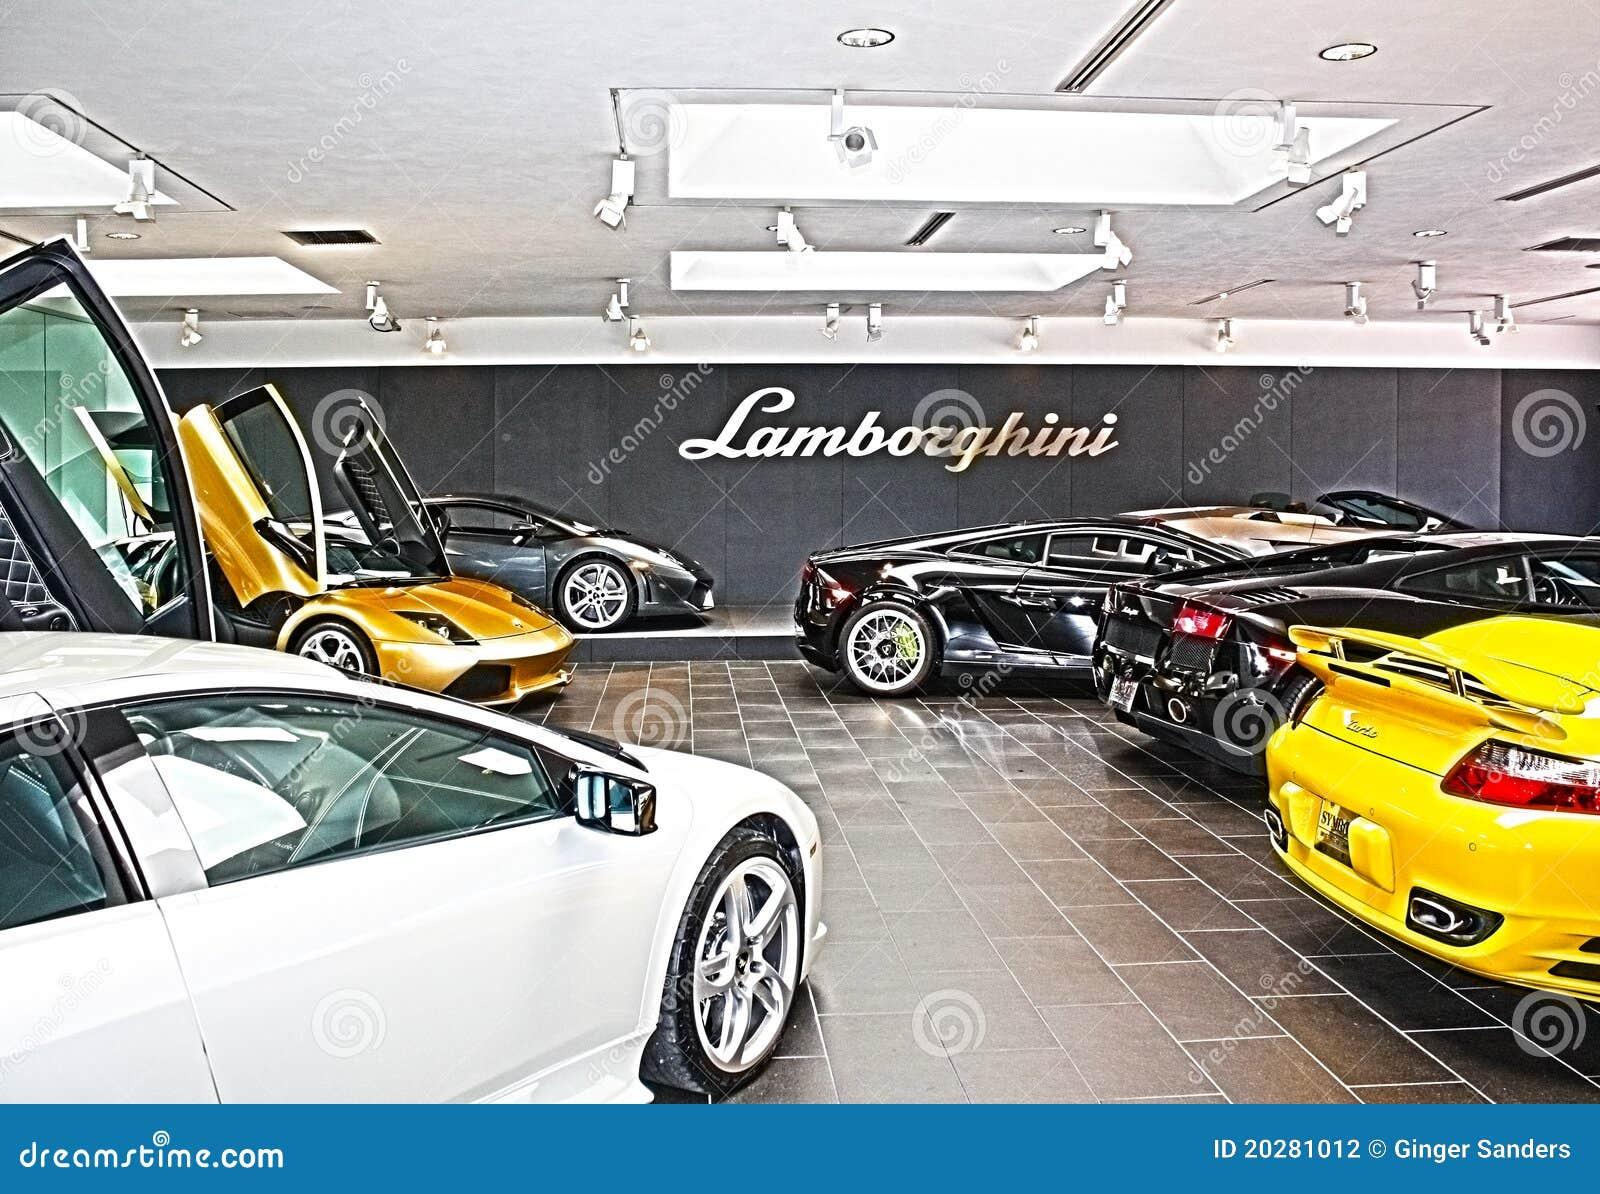 Lamborghini Sales Floor HDR